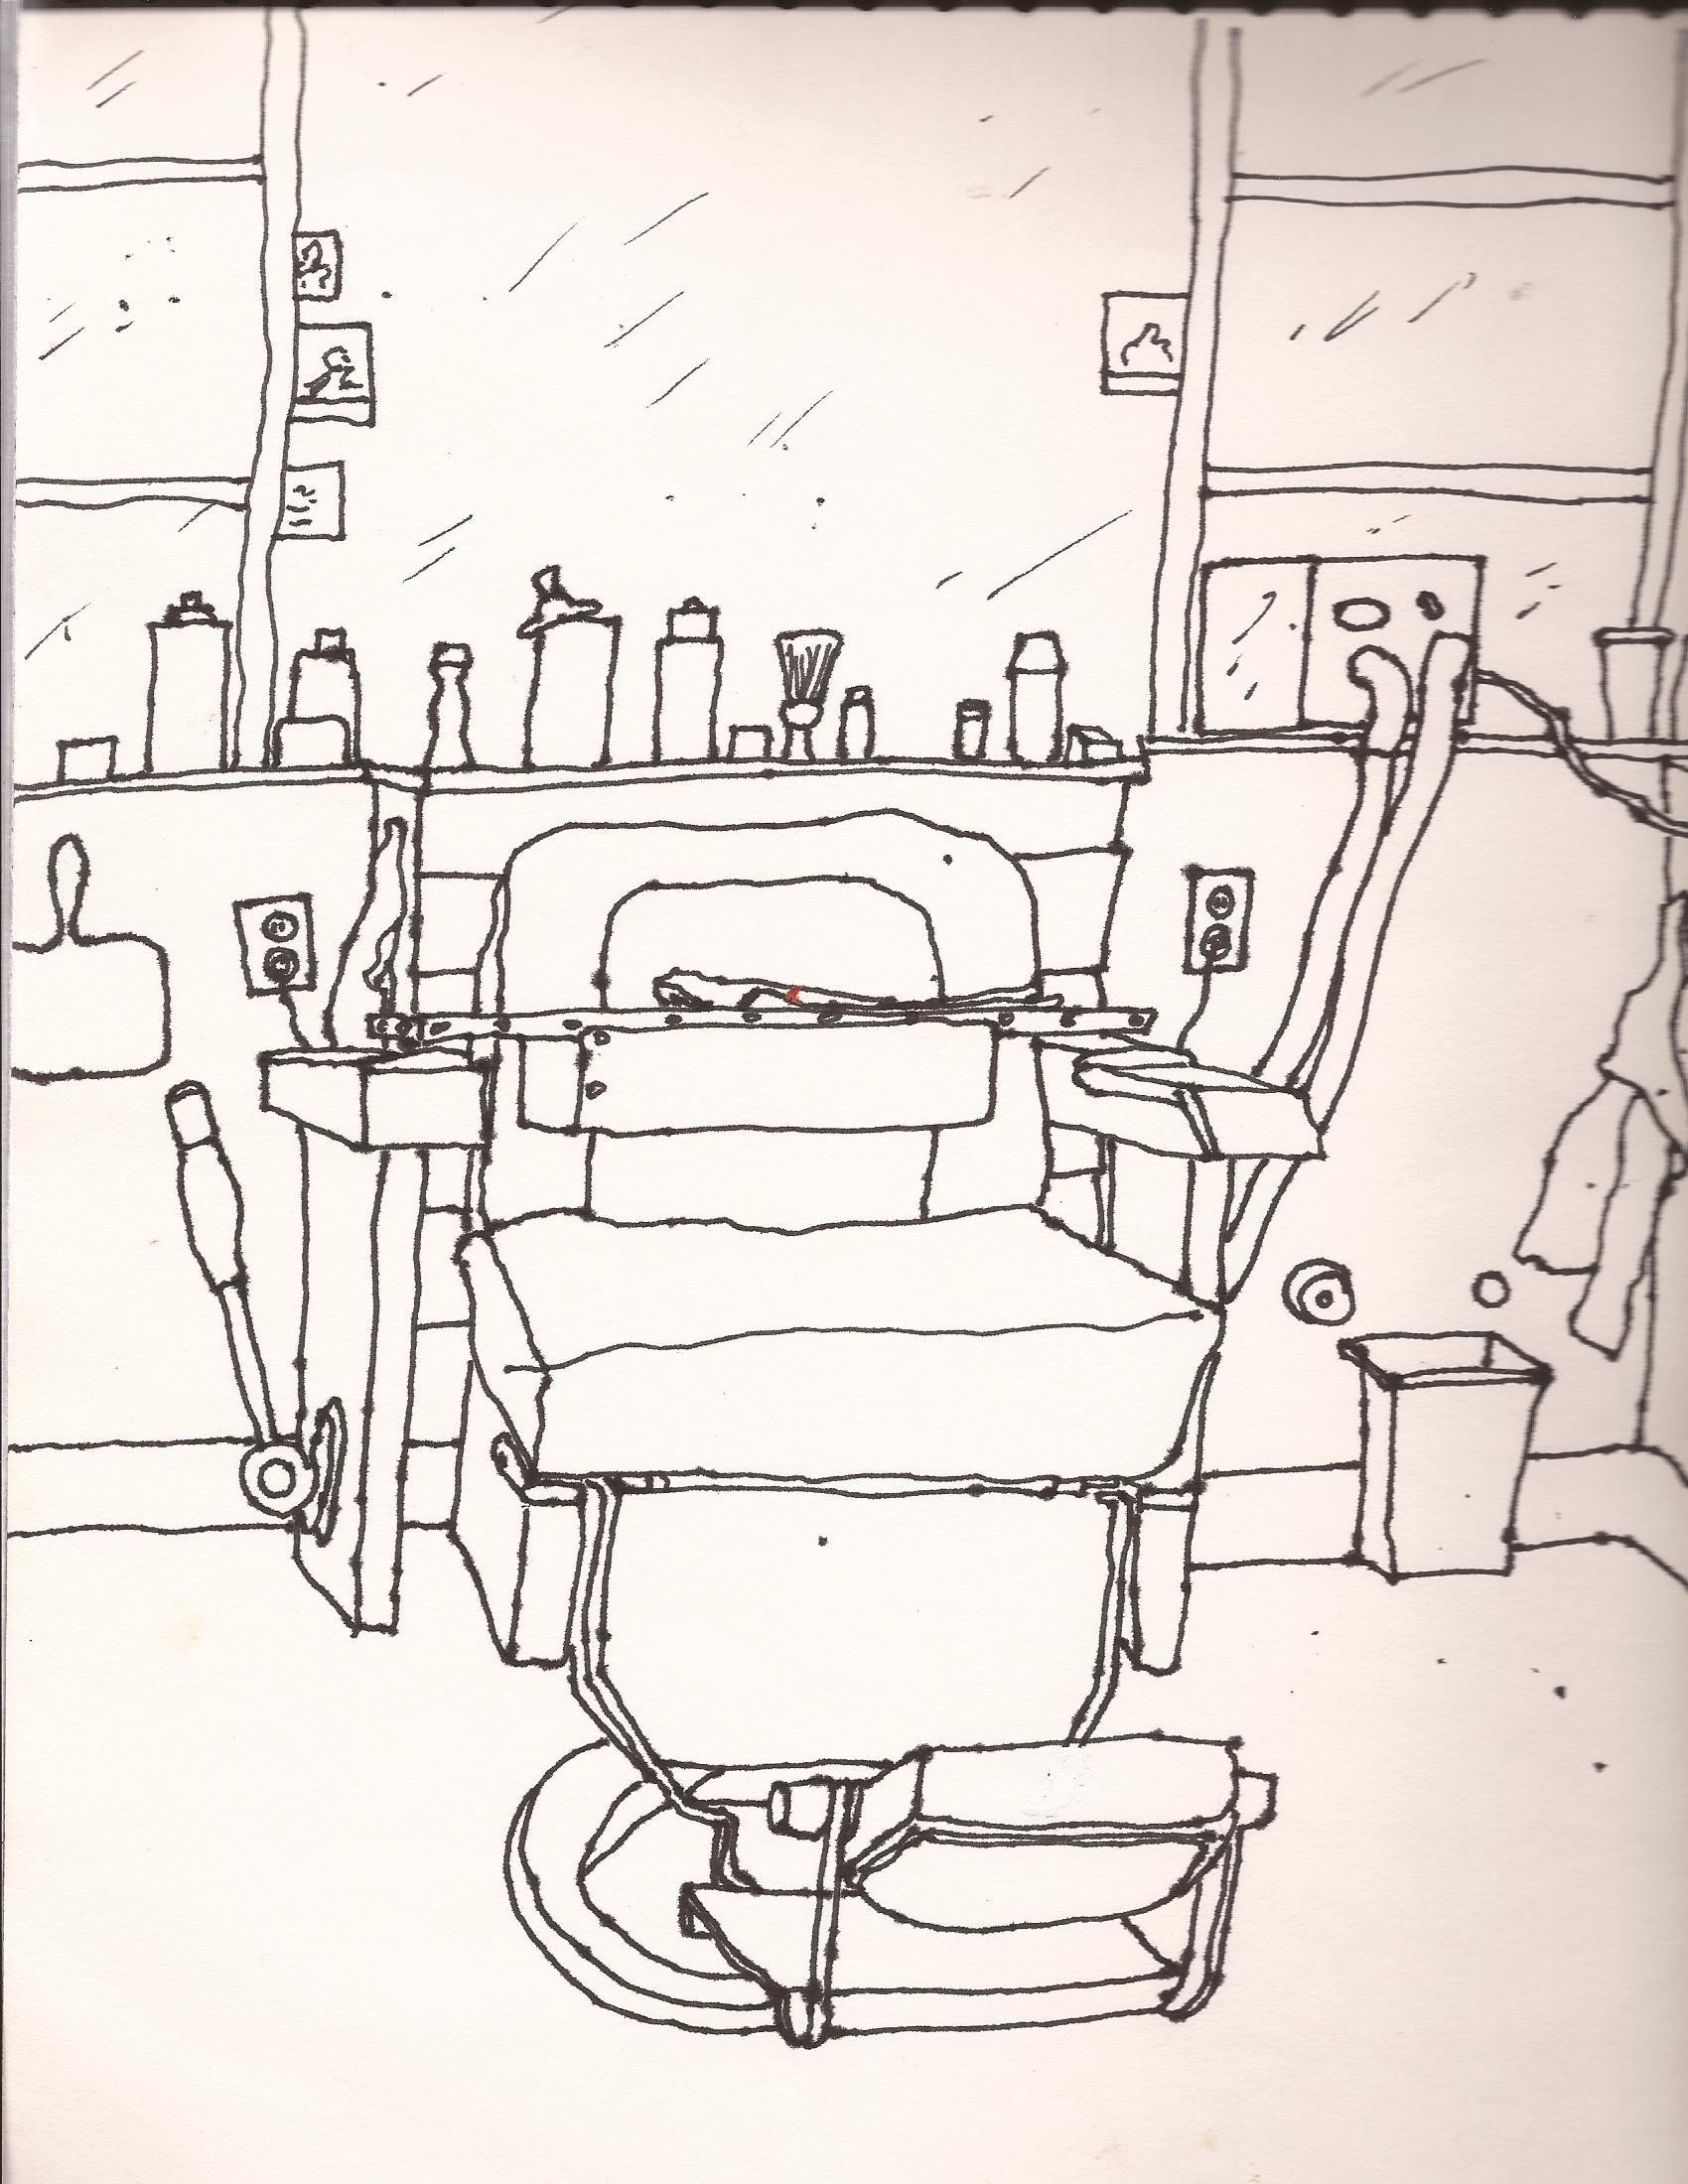 Barber chair line drawing line drawing drawings artwork